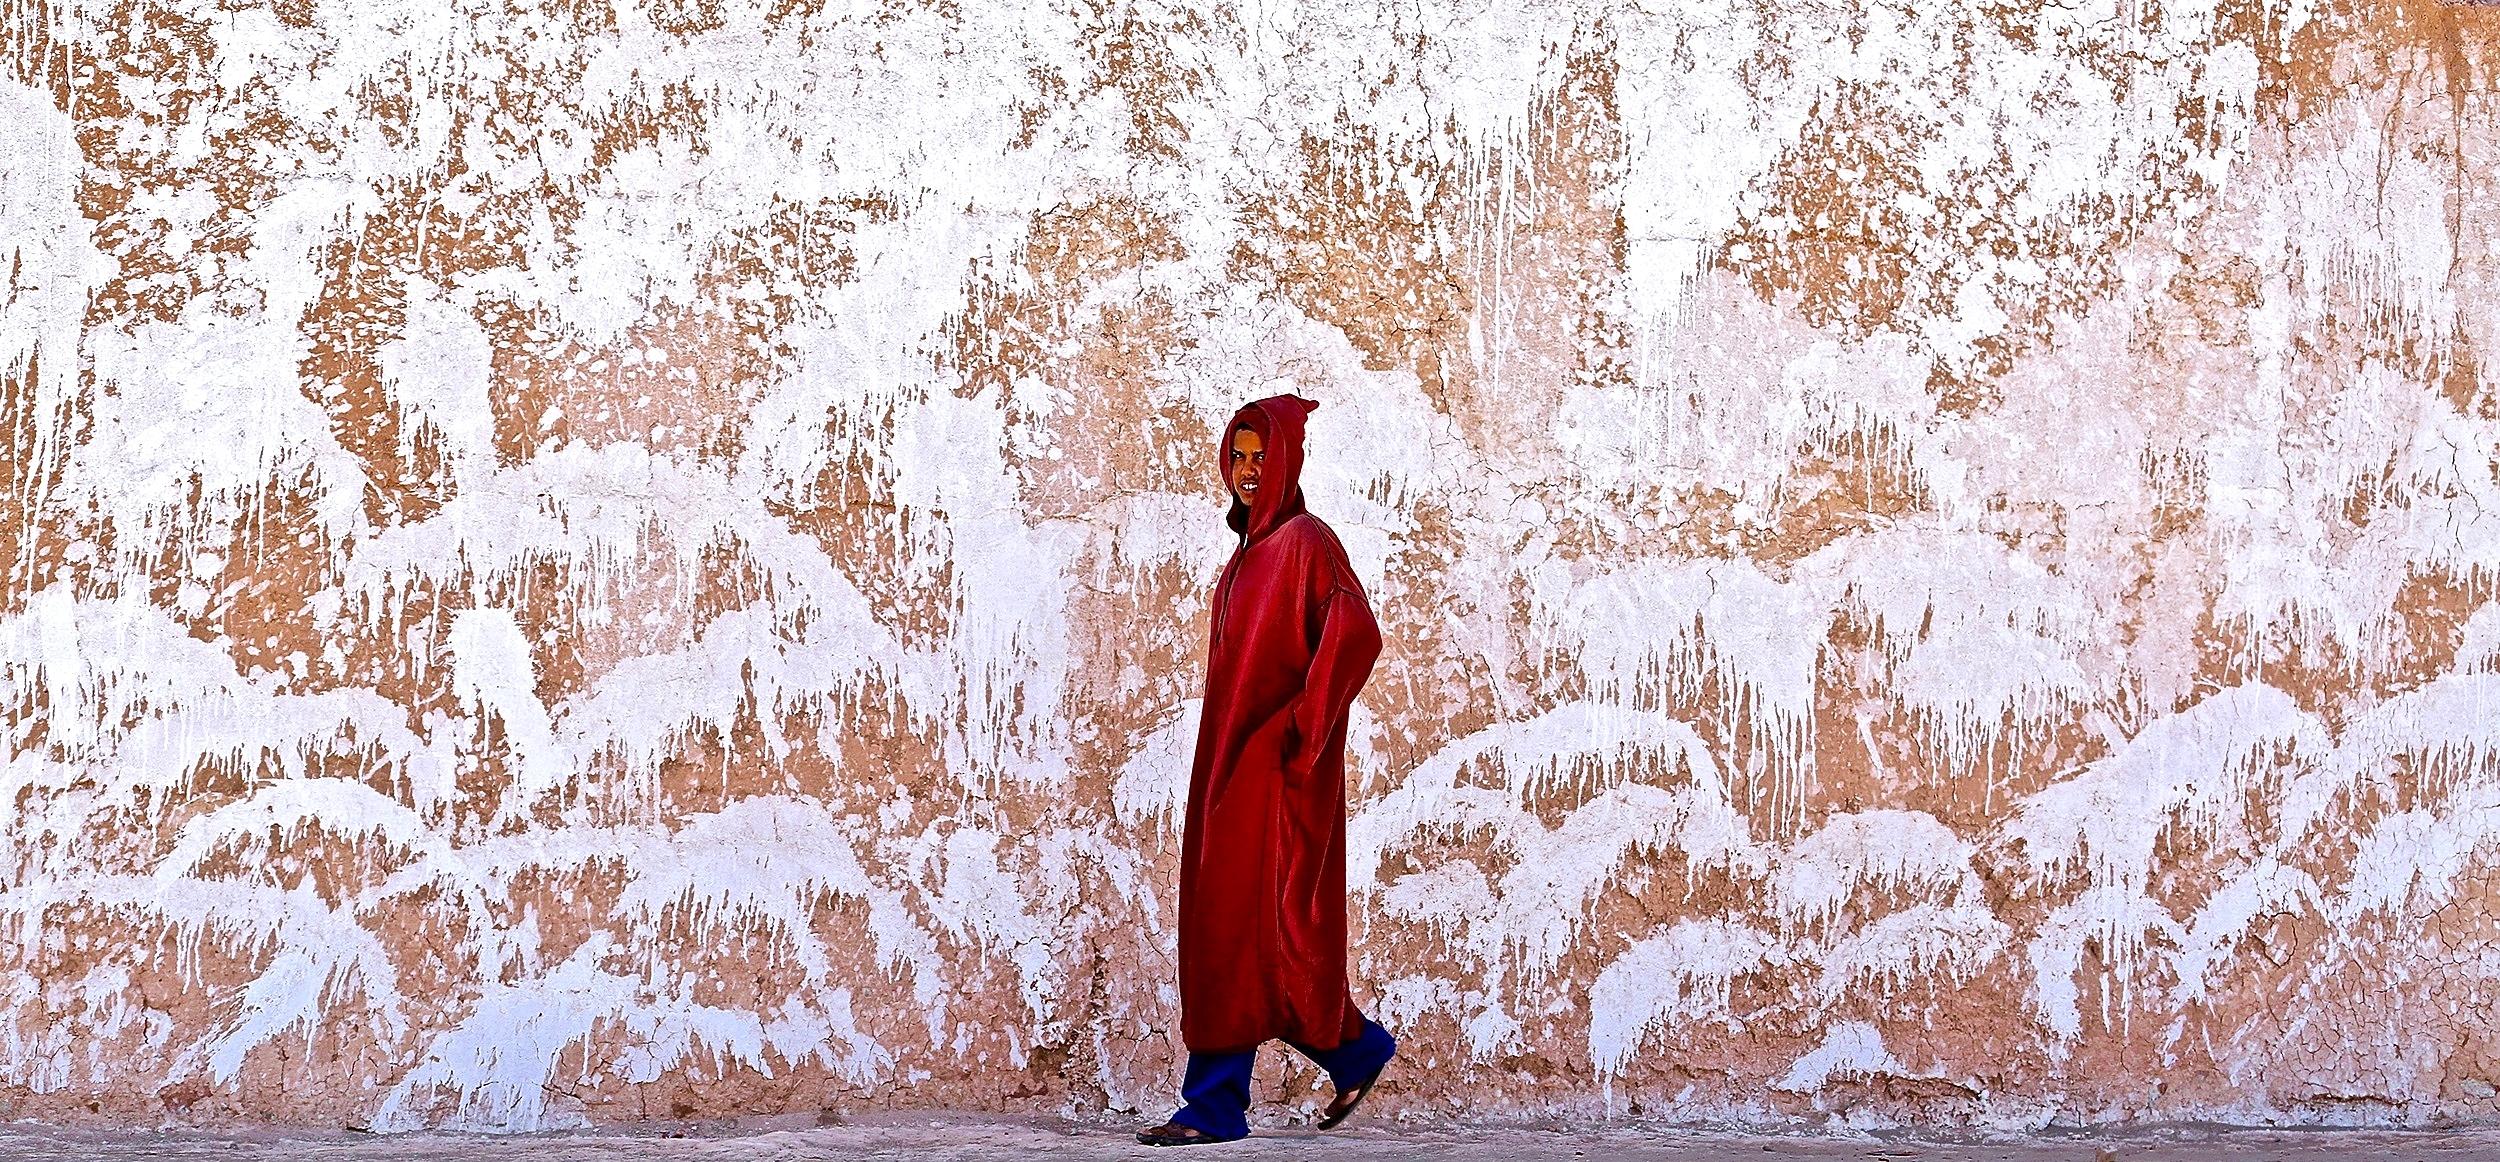 Amizmiz, Morocco